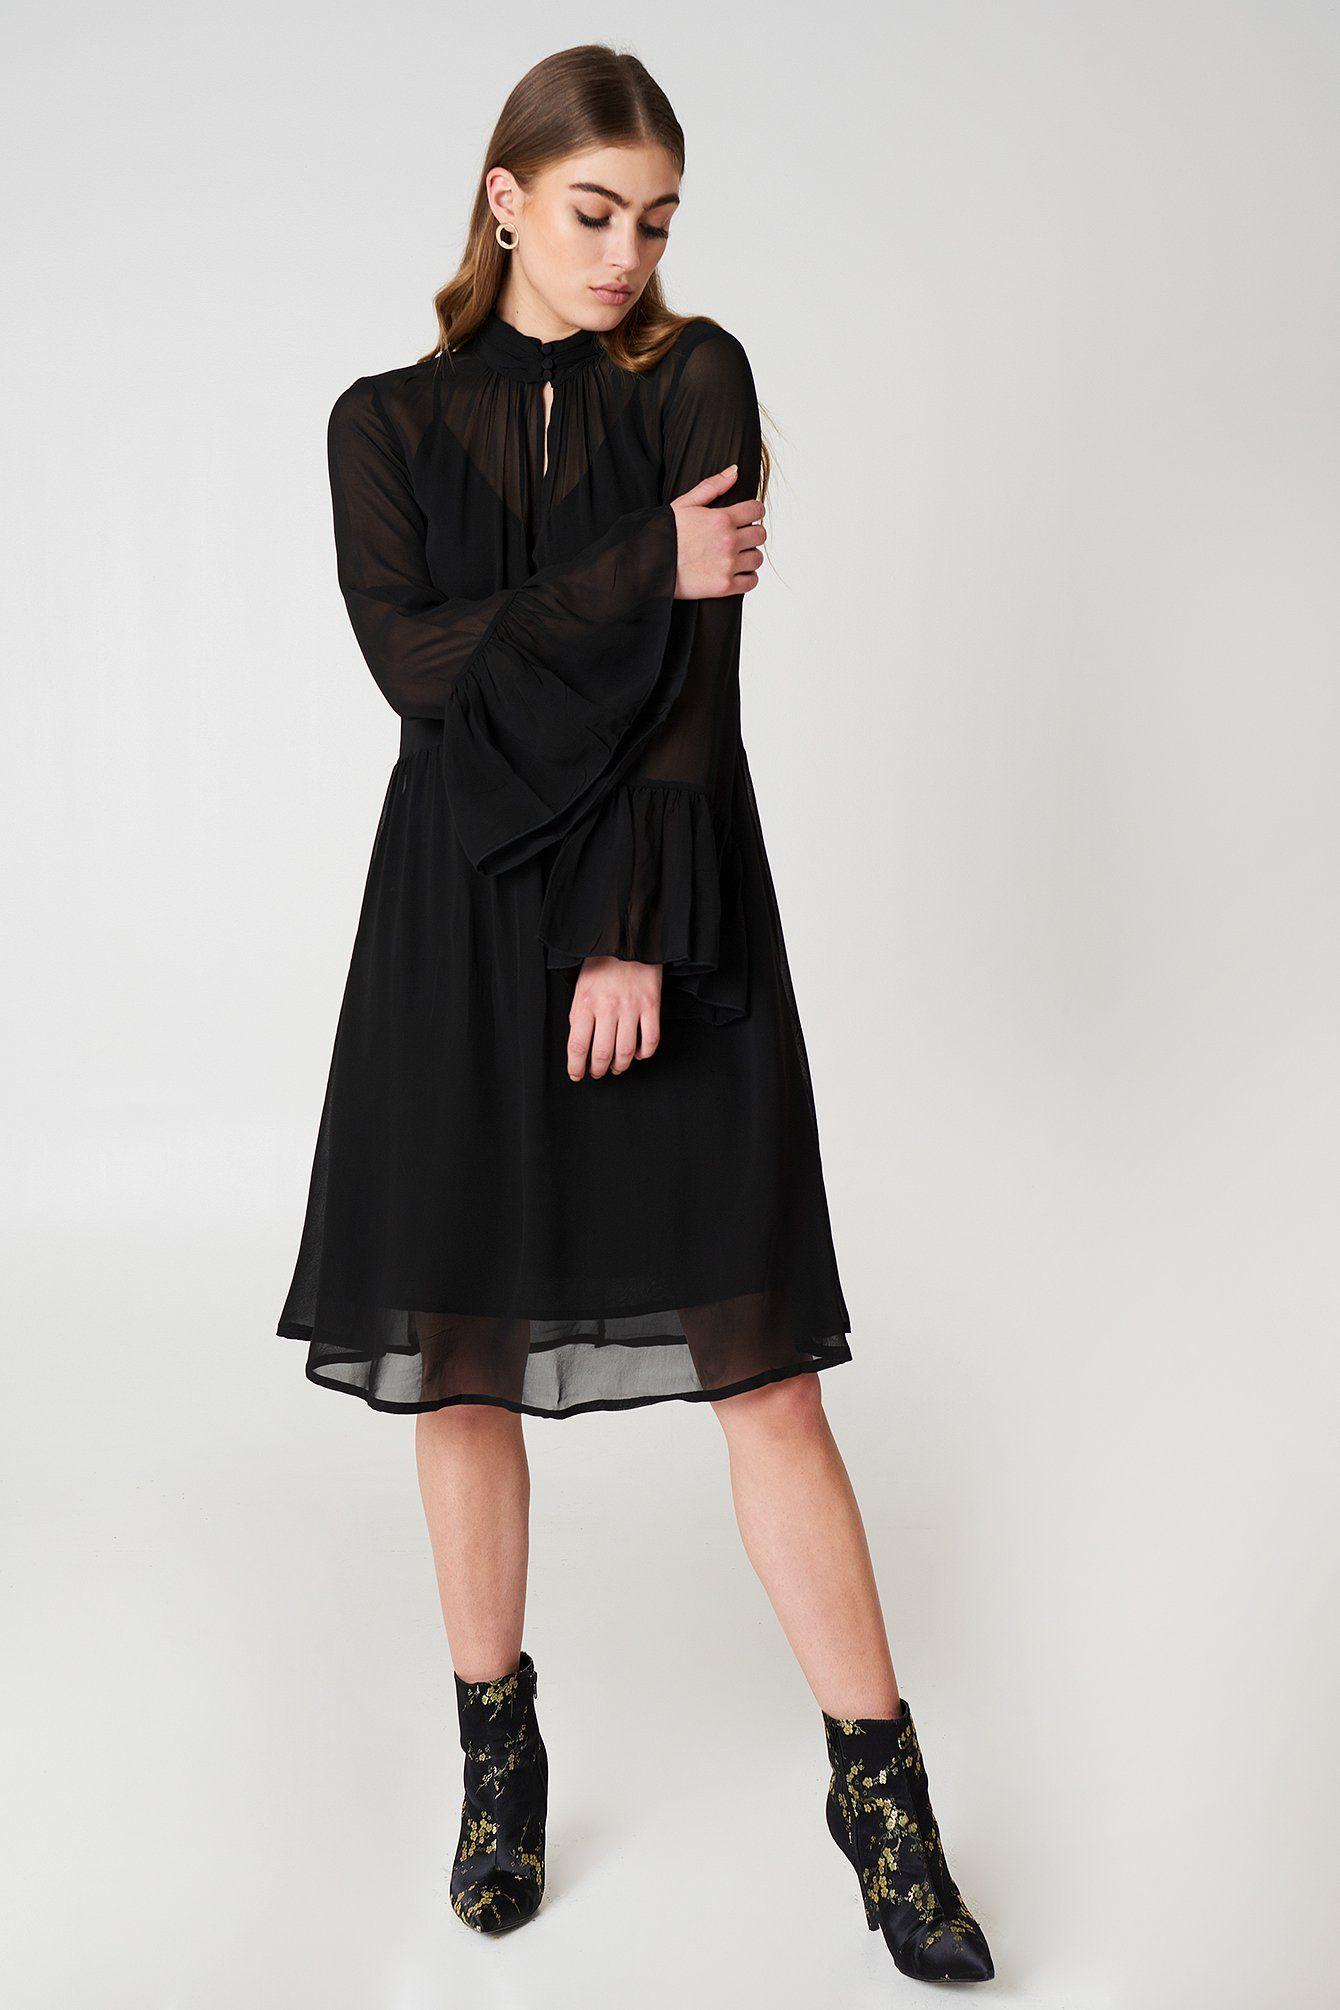 7f5288dc Gestuz Baxtor Dress - Black | Bree Wilson – Sophisticated Siren ...